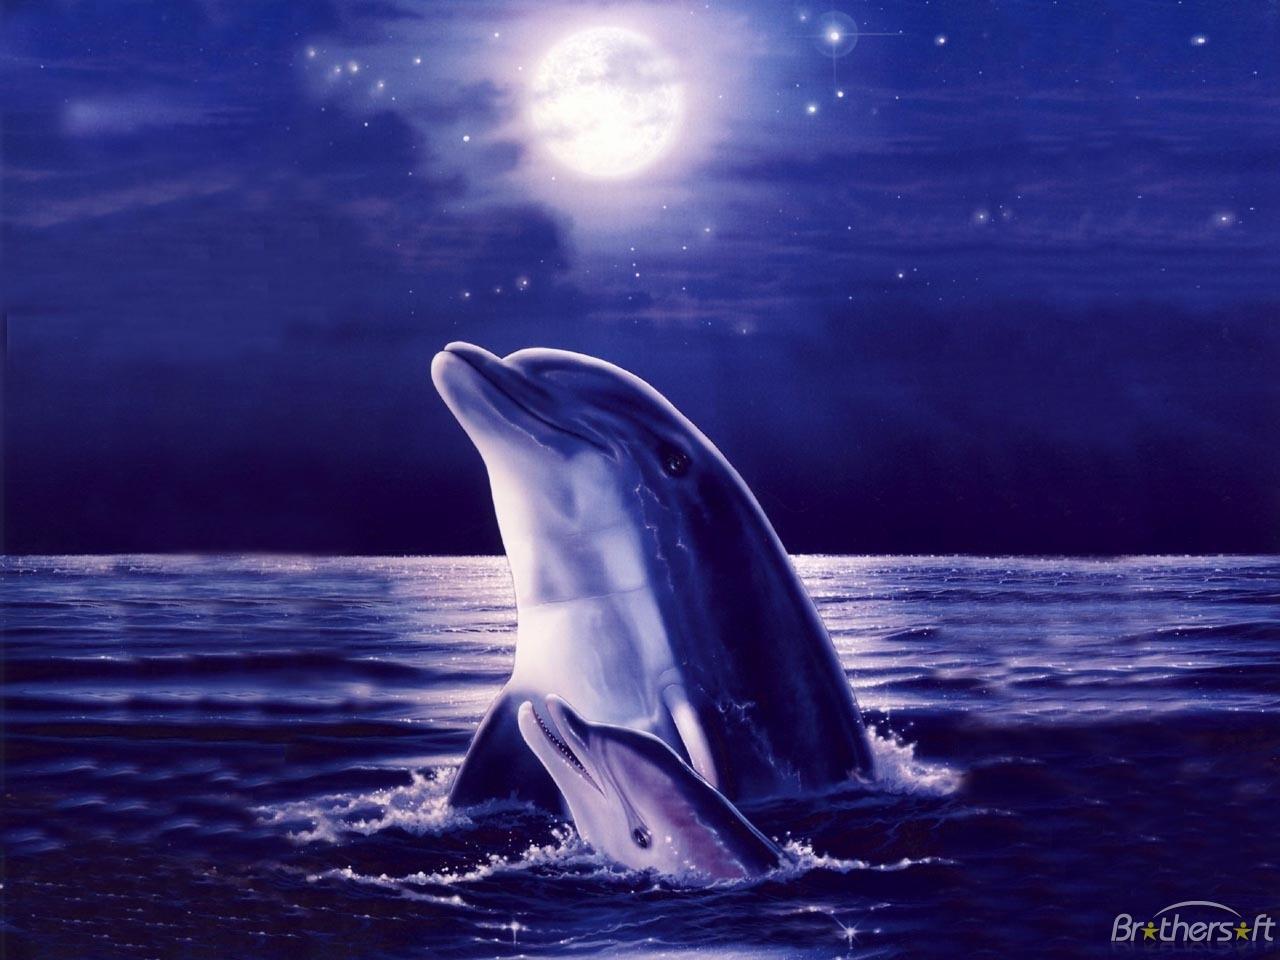 Free dolphin for desktop wallpaper 1280x960 13096 free dolphin wallpaper for desktop voltagebd Gallery